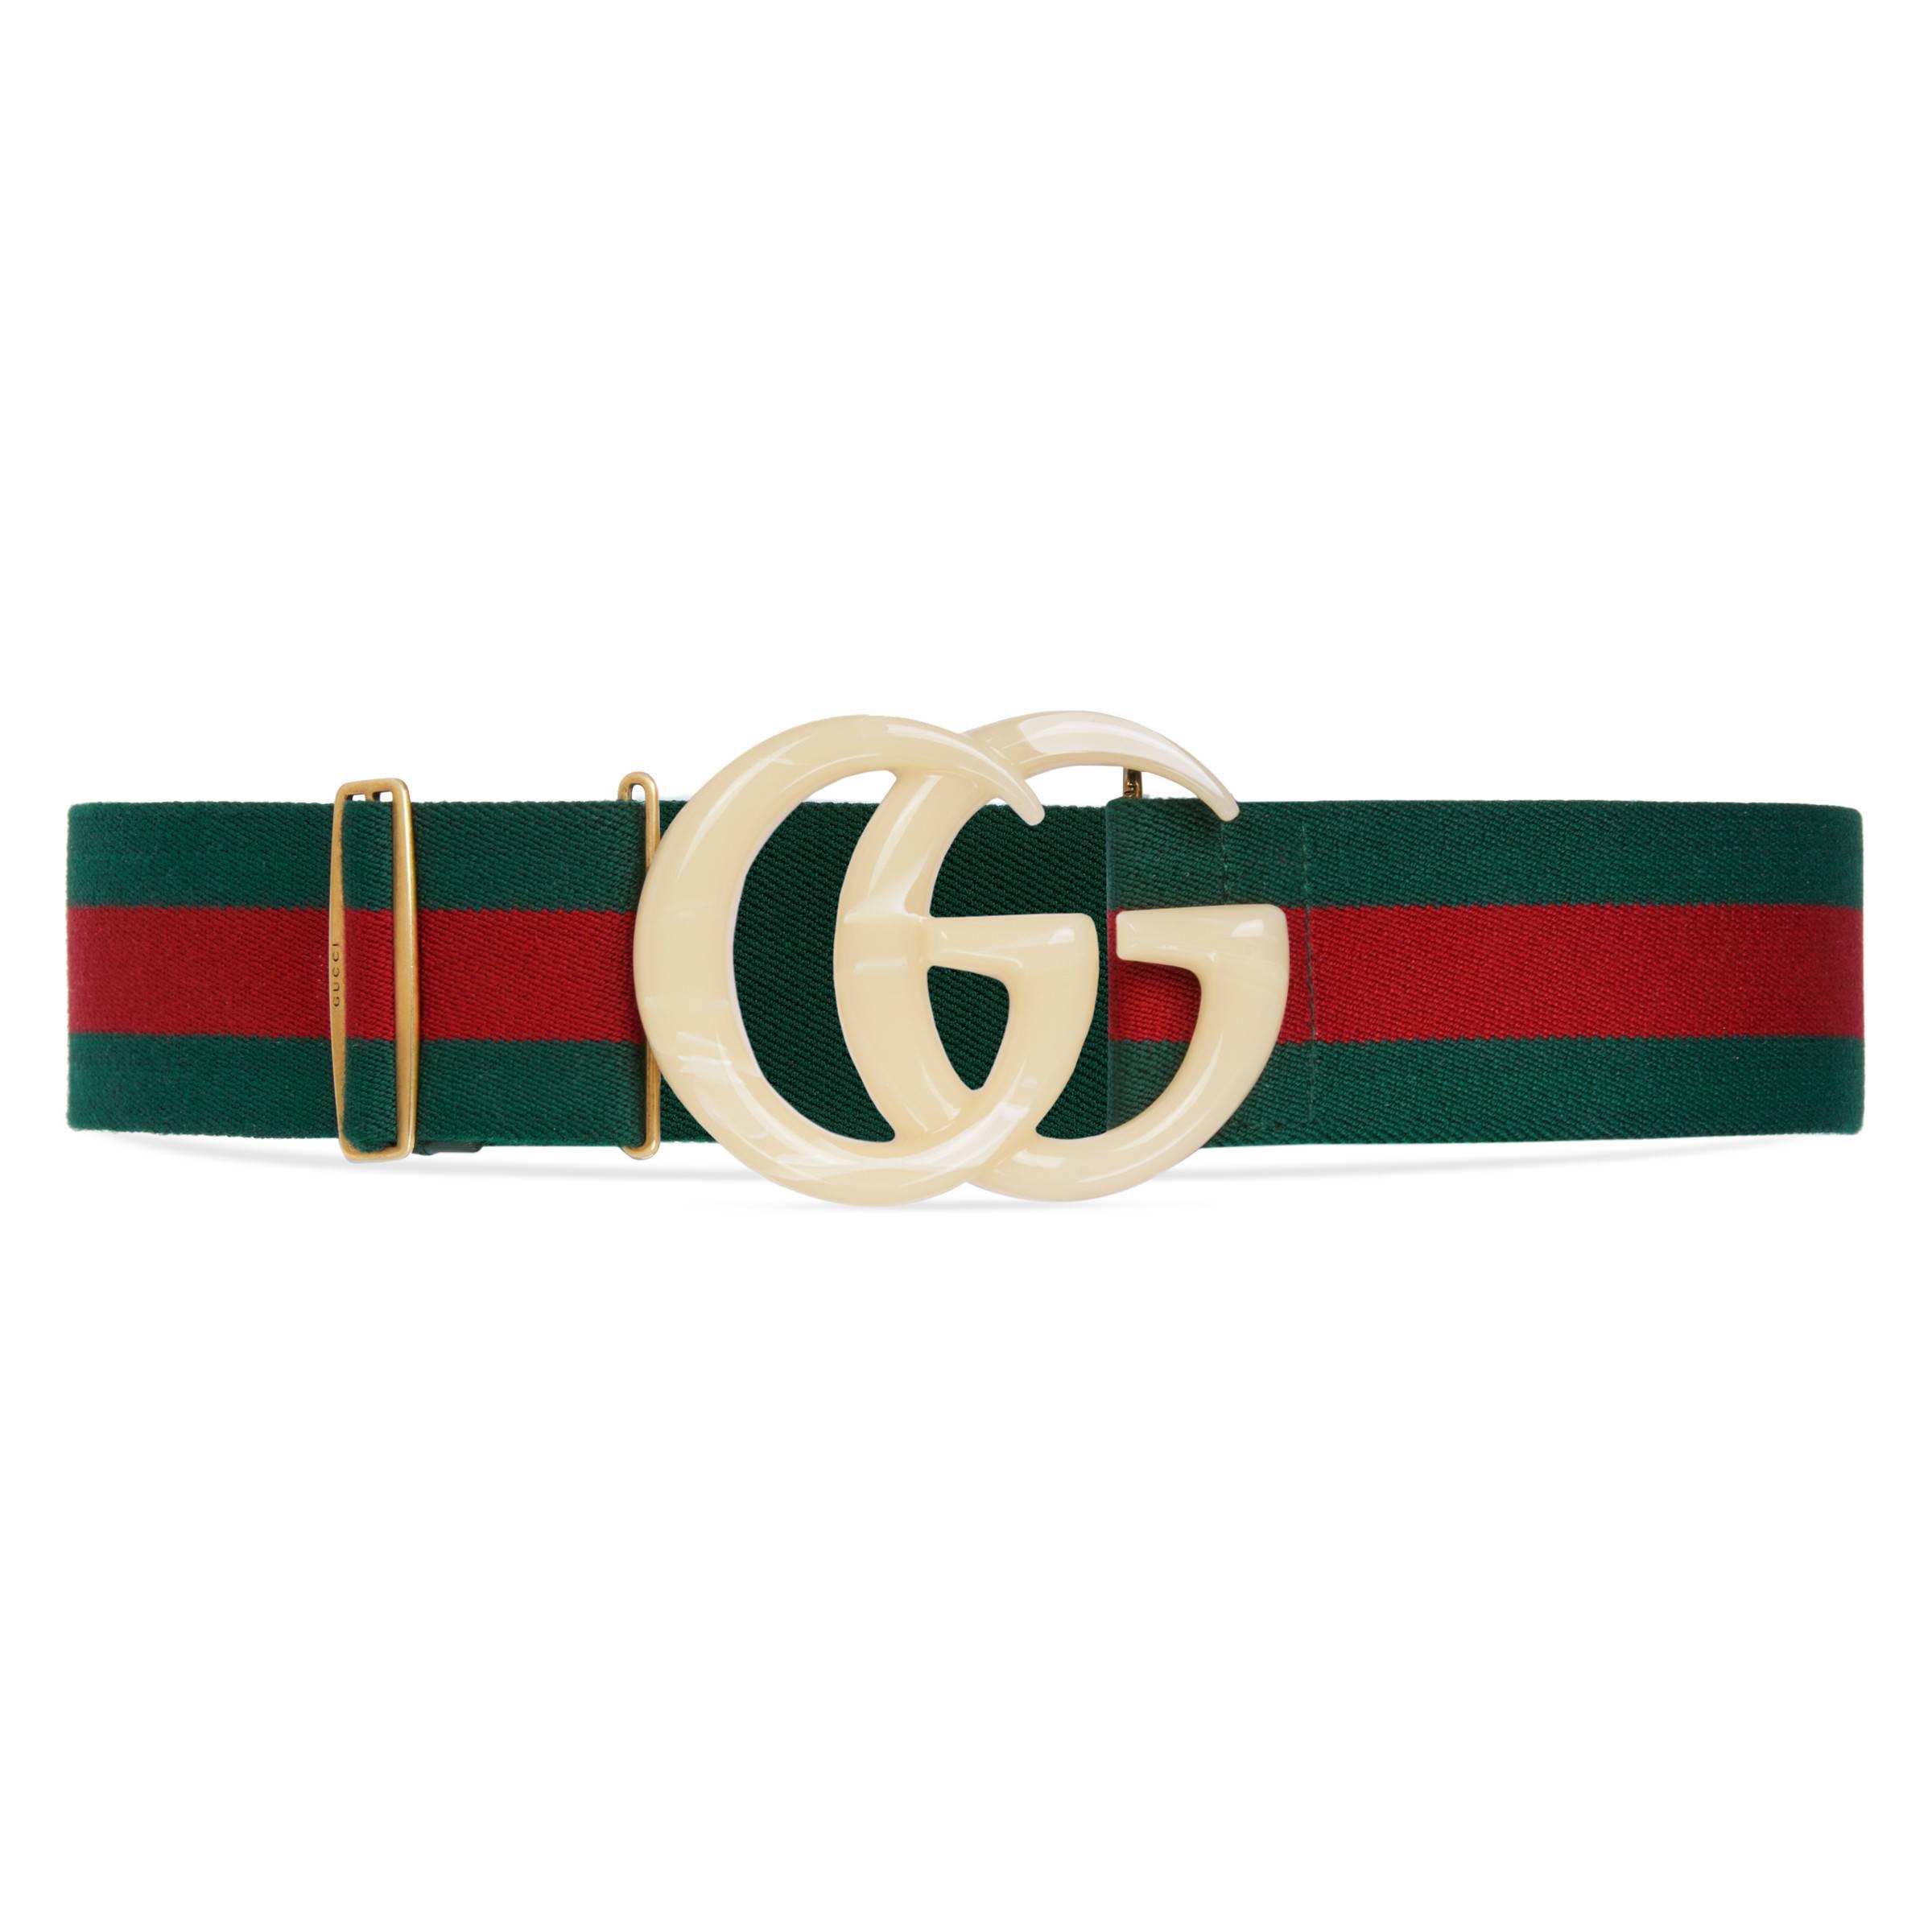 4c875aae48c Gucci - Green Elastic Web Belt With Double G Buckle - Lyst. View fullscreen